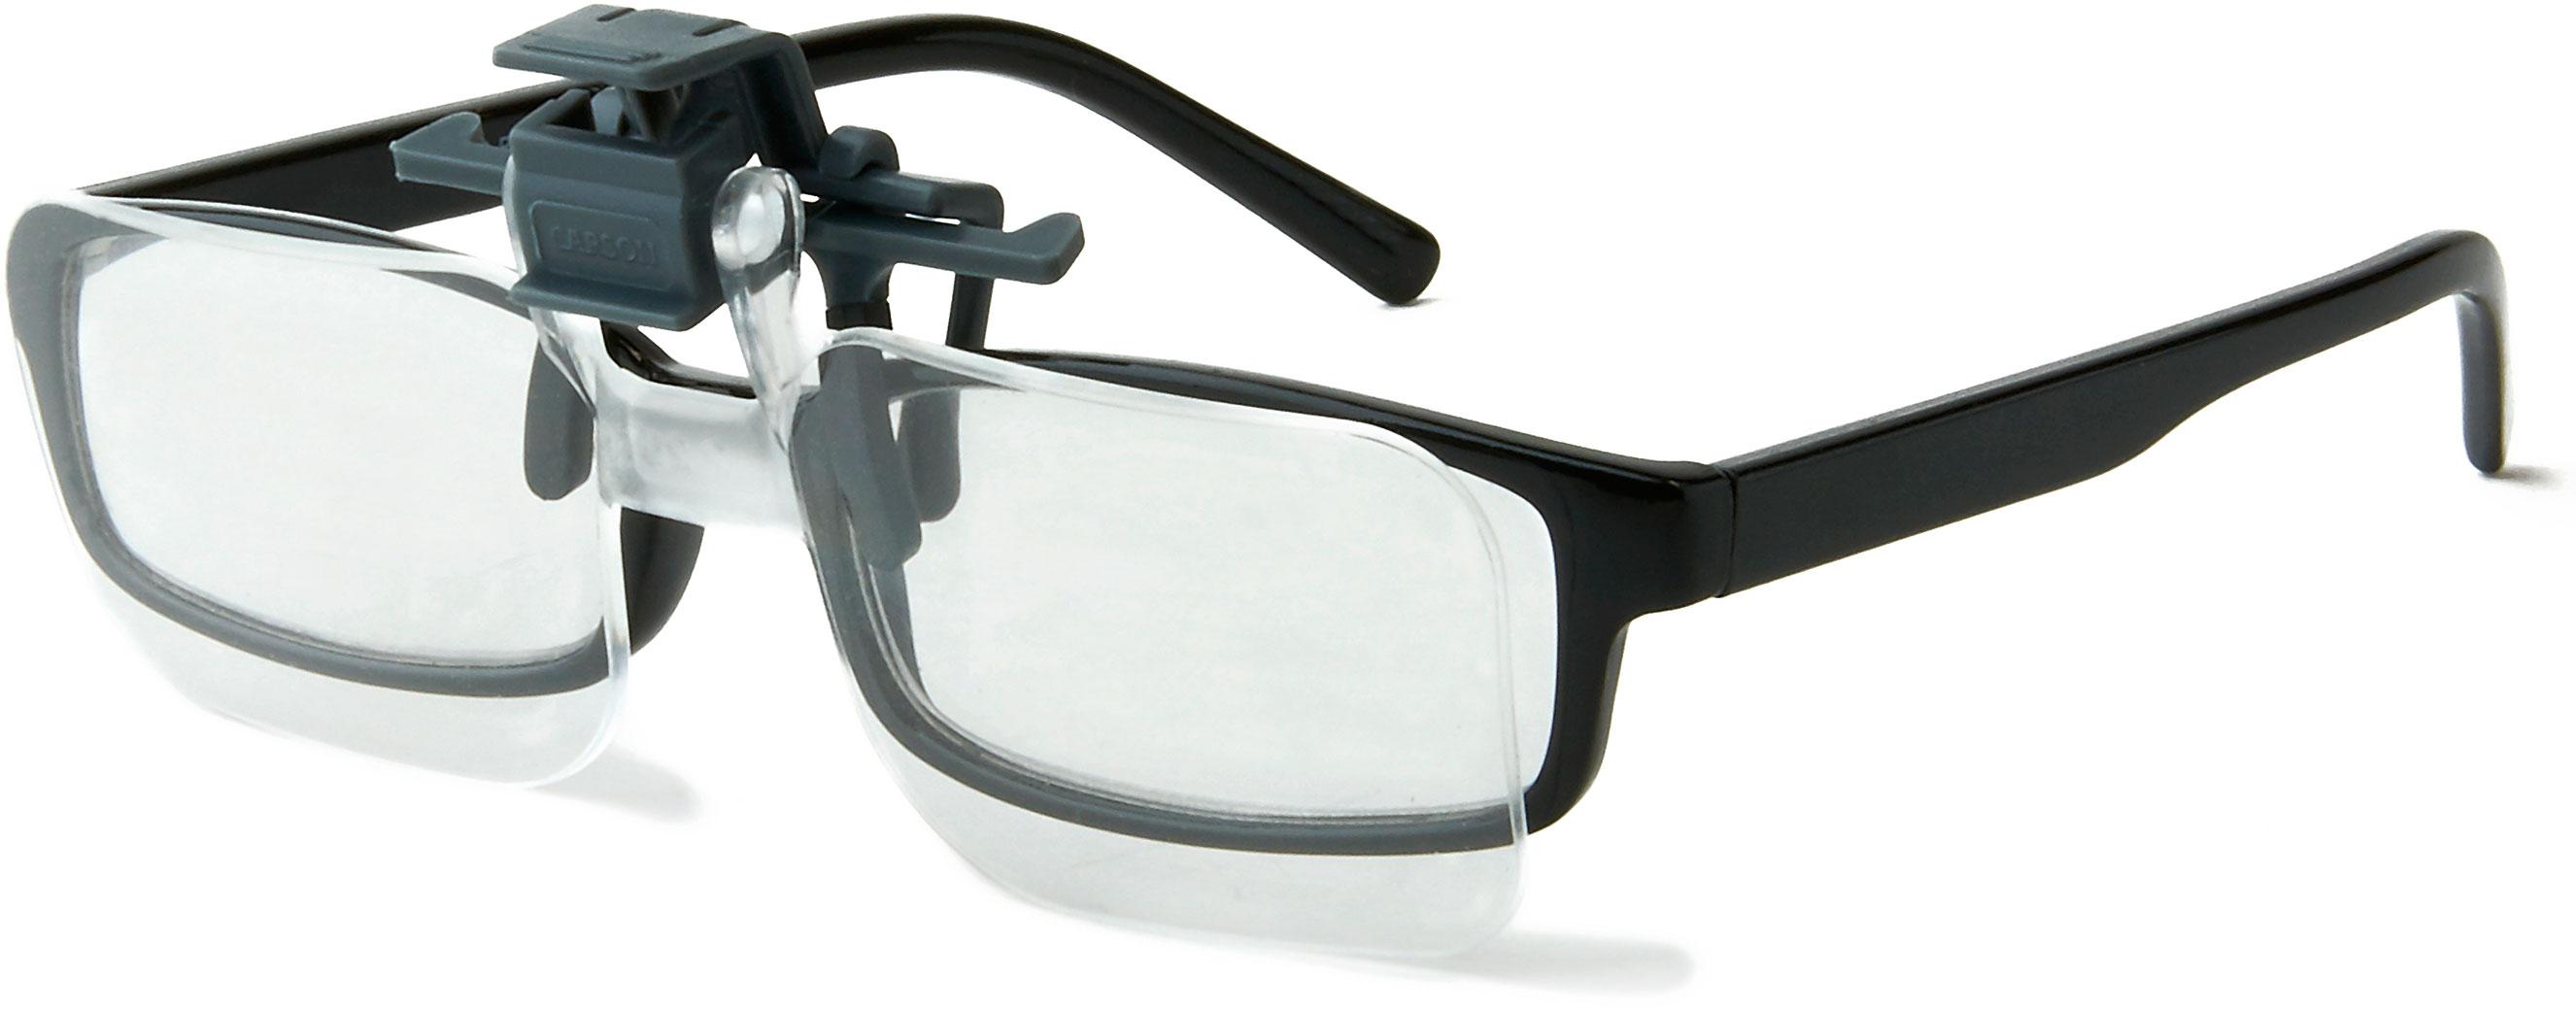 Carson Optical CF-10 Clip and Flip Magnifying Lenses for Eyeglasses